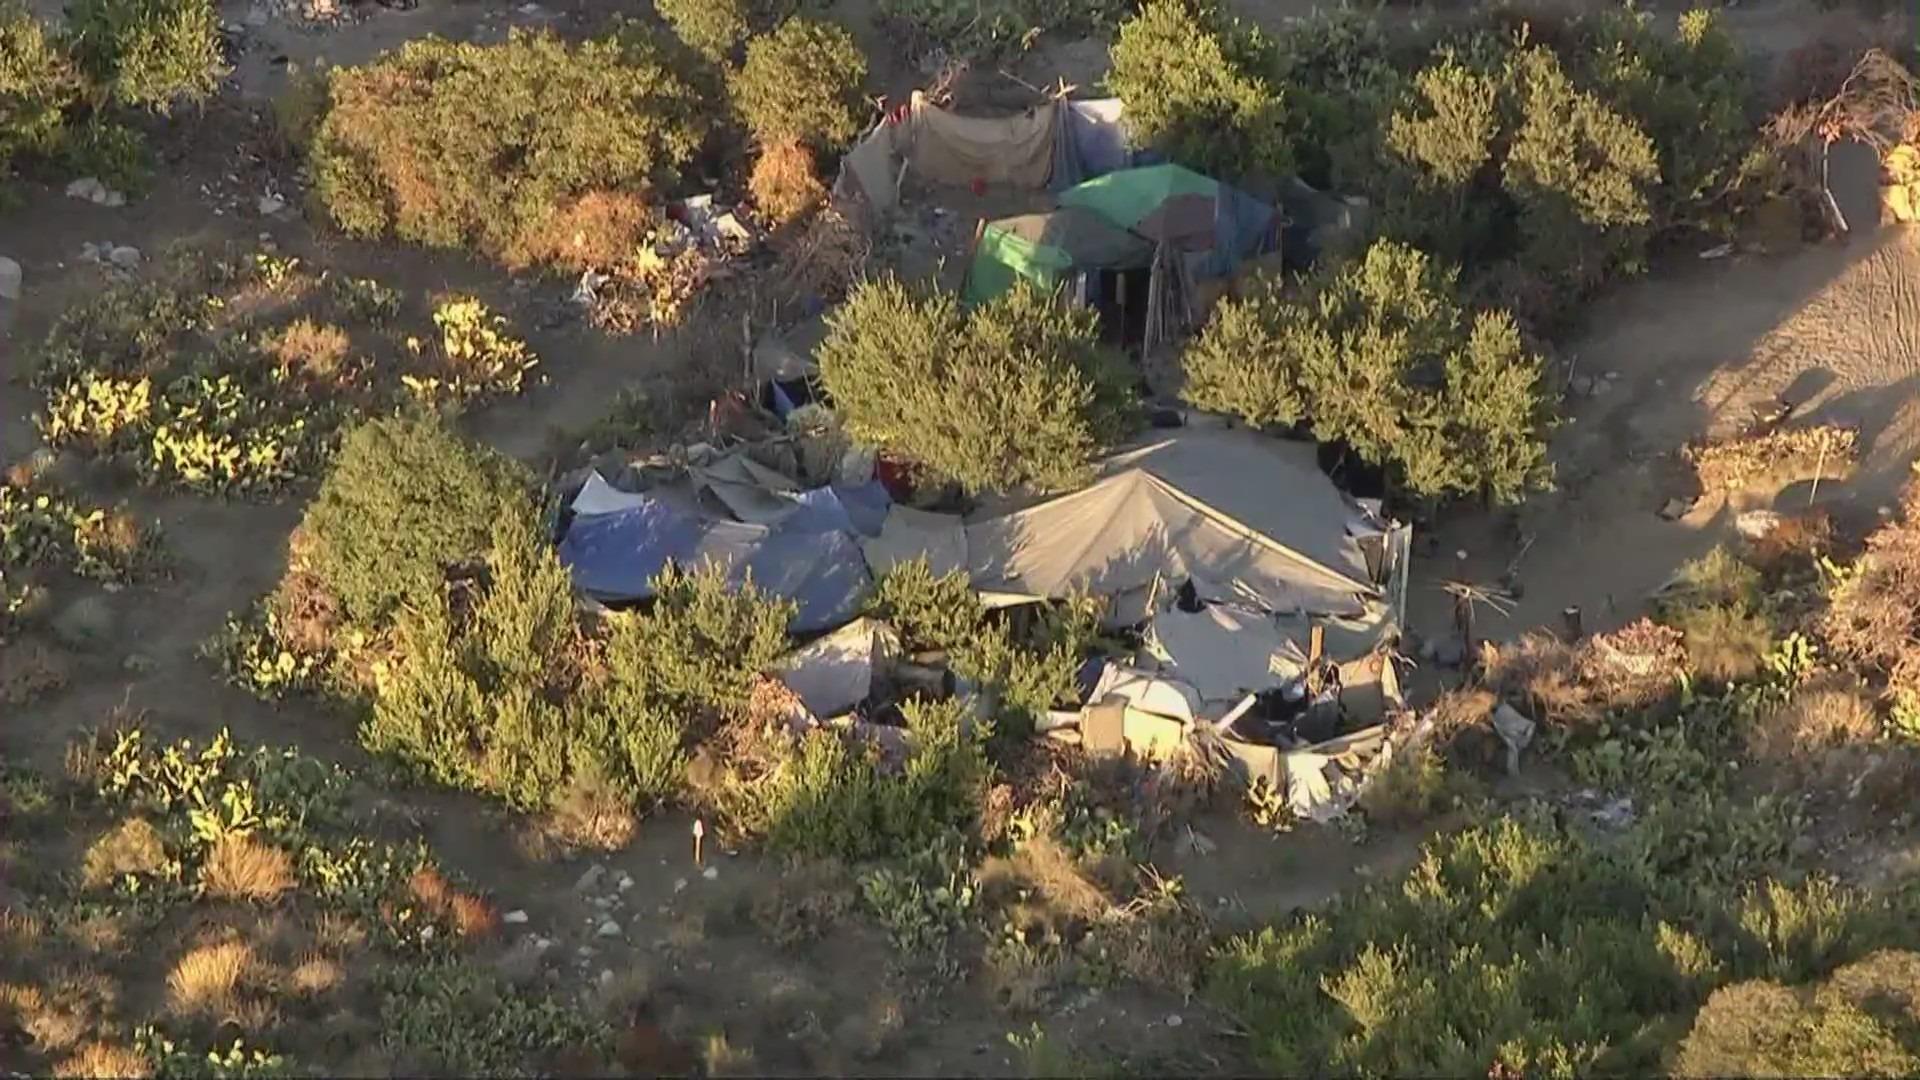 A homeless encampment at Lario Park is seen on Aug. 3, 2021. (KTLA)